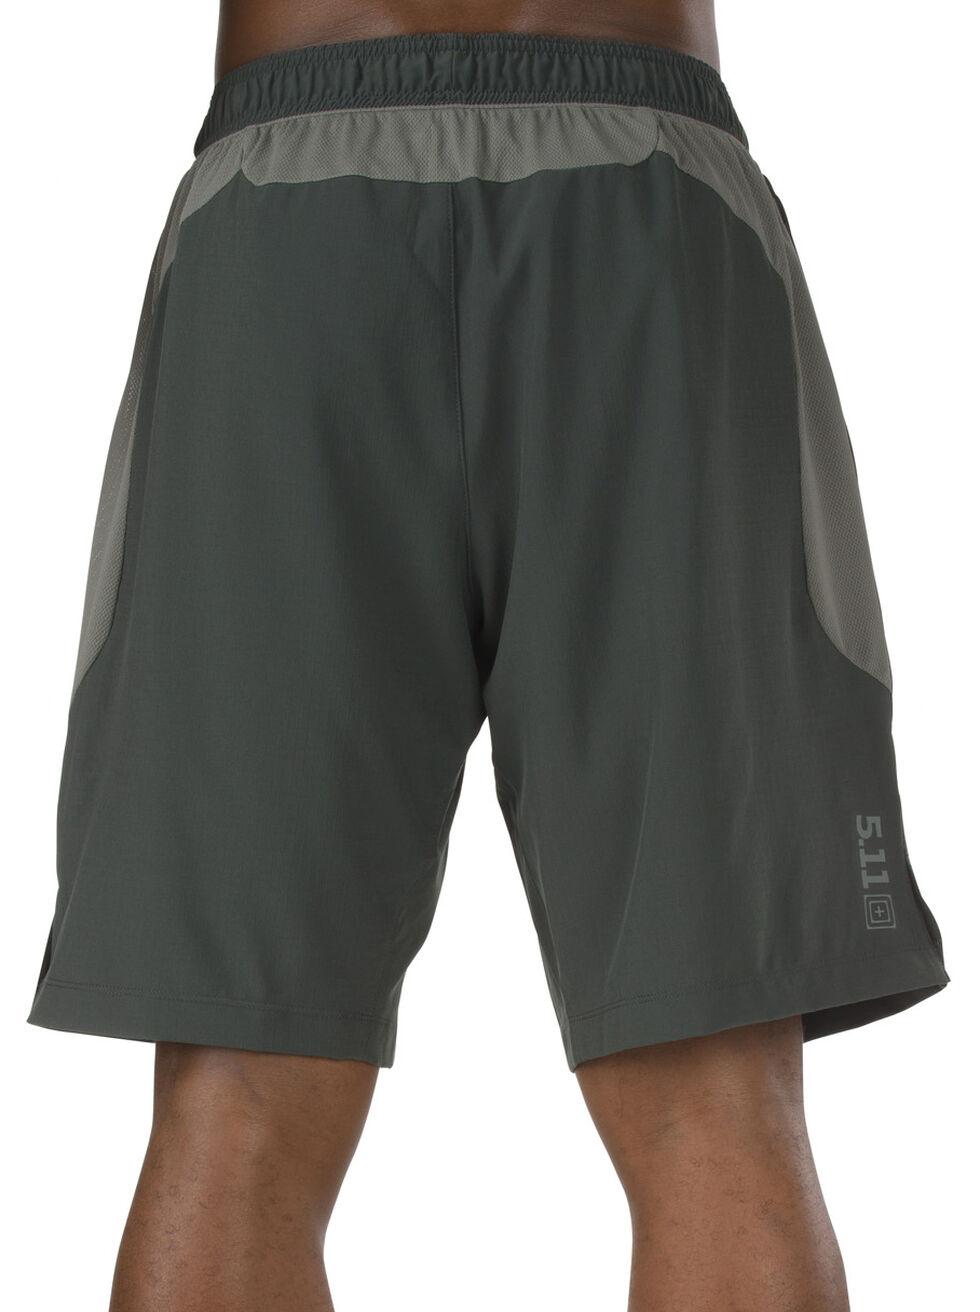 5.11 Tactical Men's Recon Performance Training Shorts, Earth, hi-res